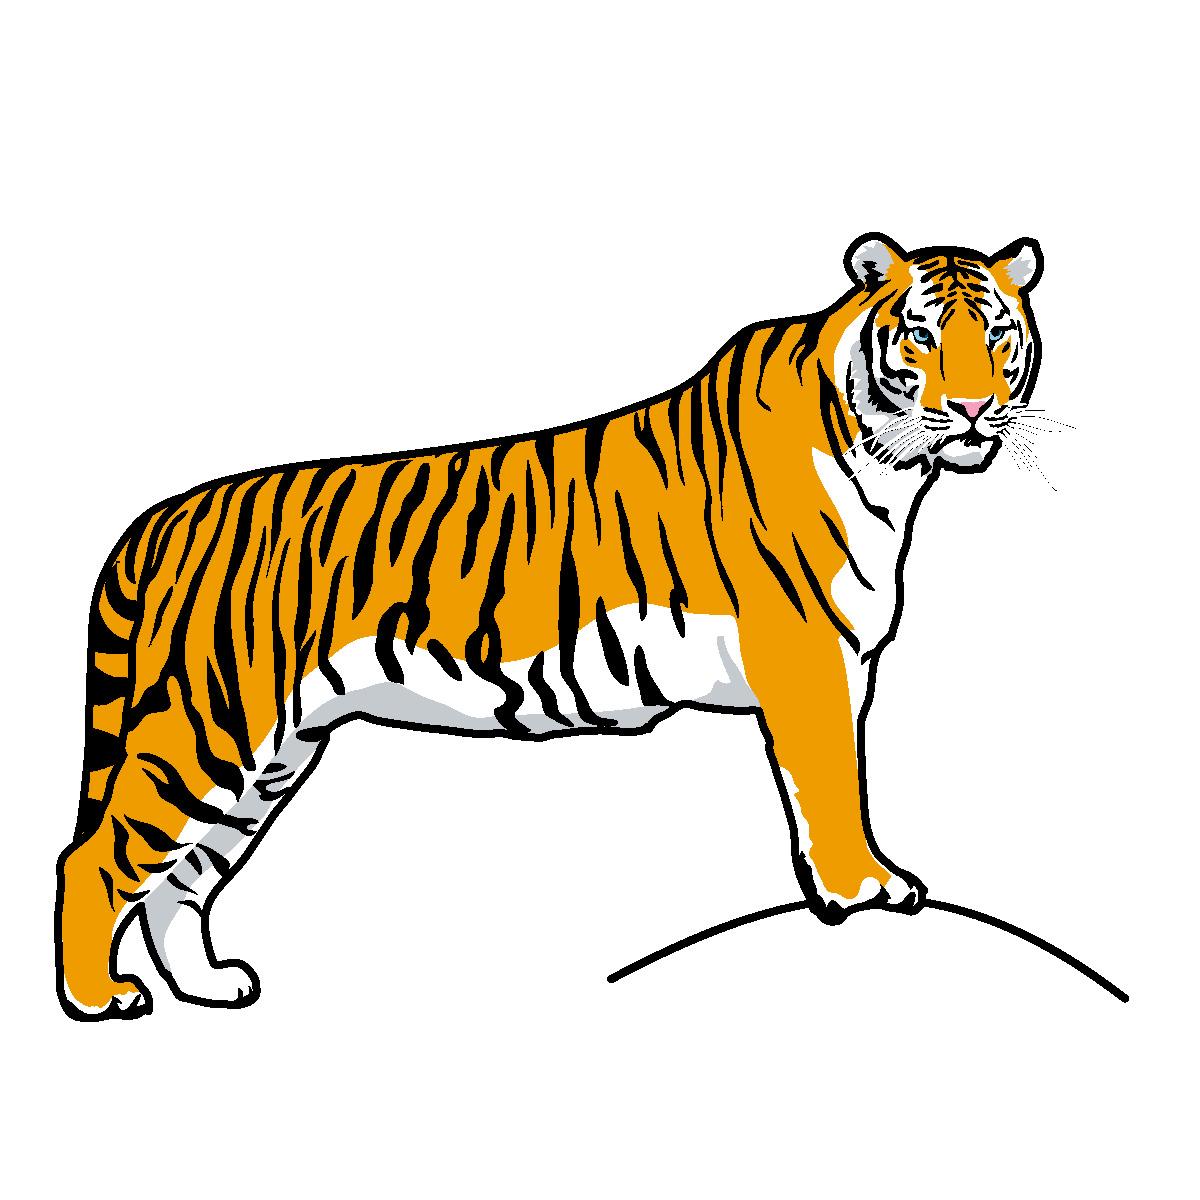 Bengal Tiger Clip Art - ClipArt Best